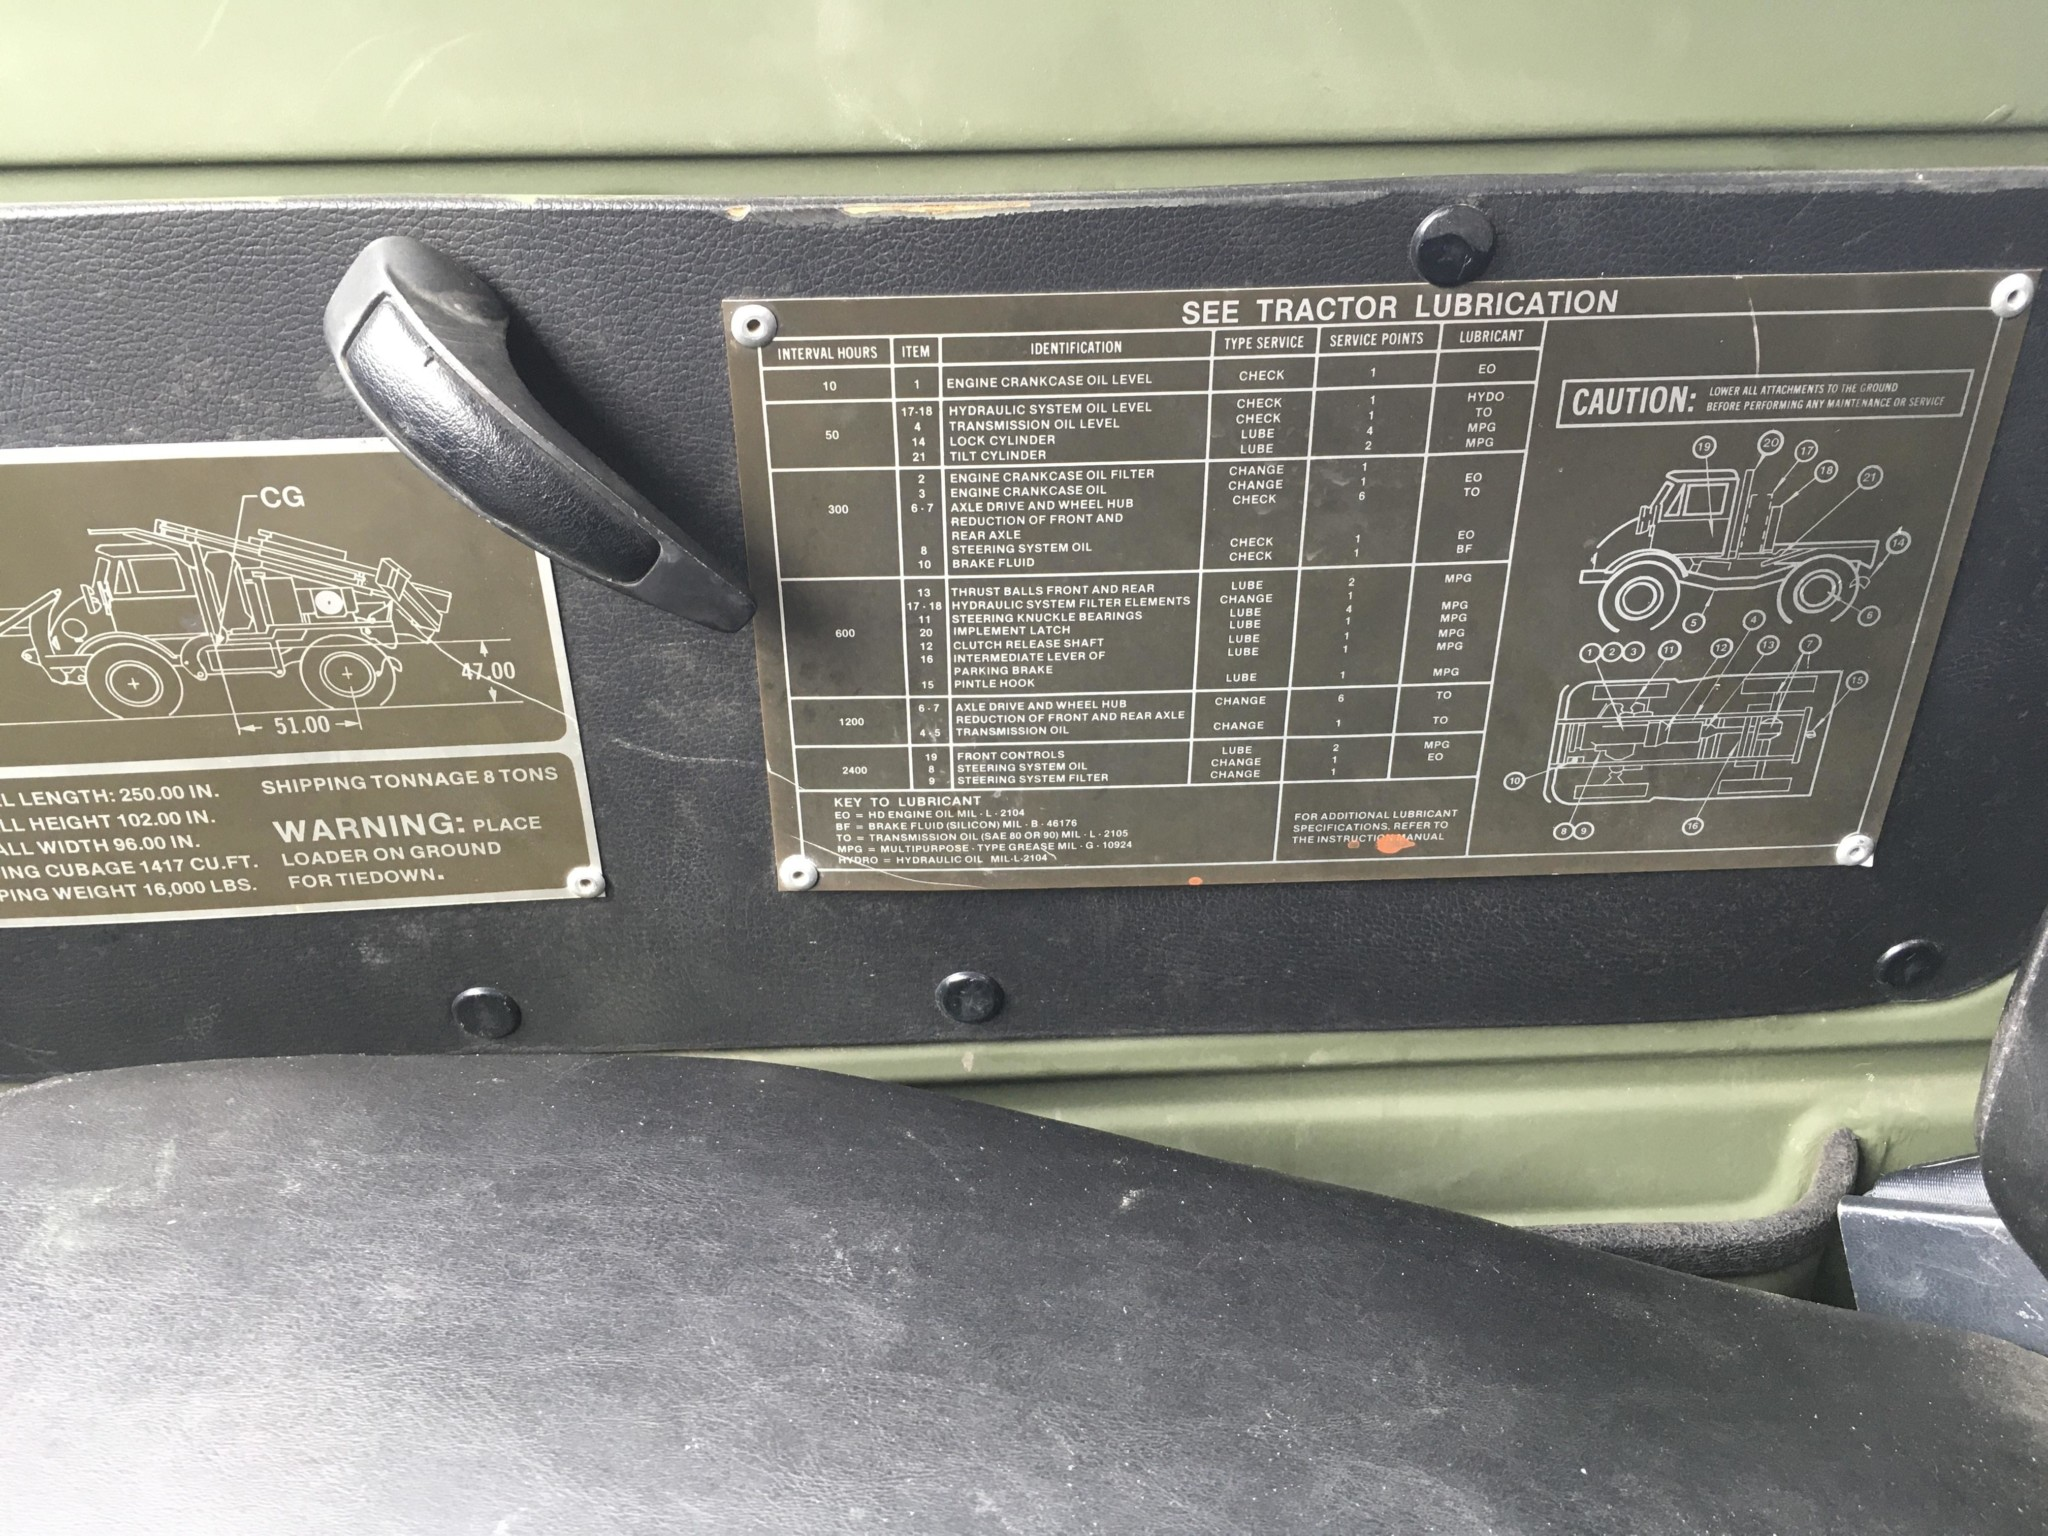 1989 Freightliner Unimog 419 placards